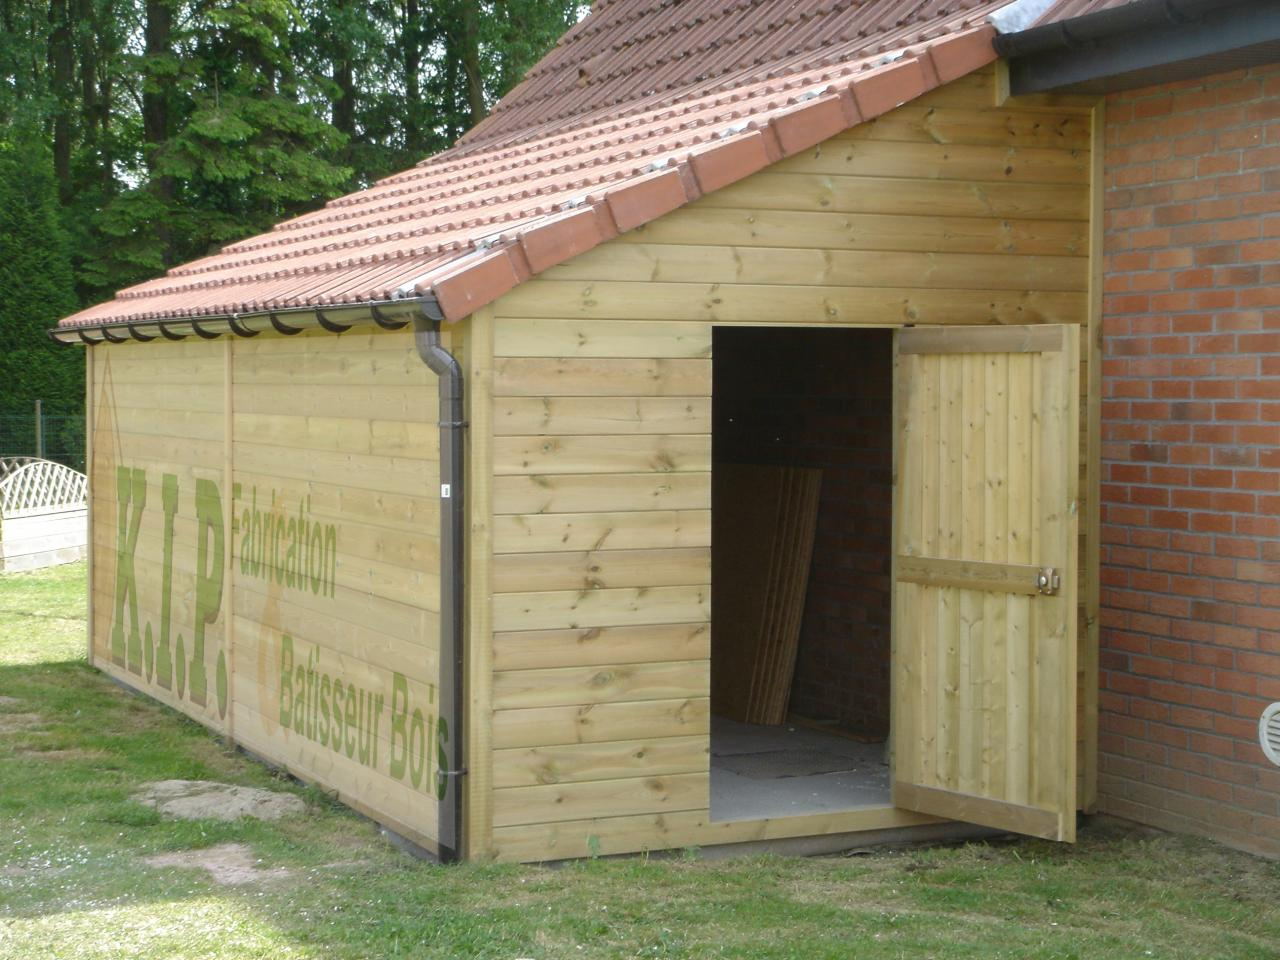 Cabane En Bois Garage - Mailleraye.fr Jardin dedans Abris De Jardin Adossable